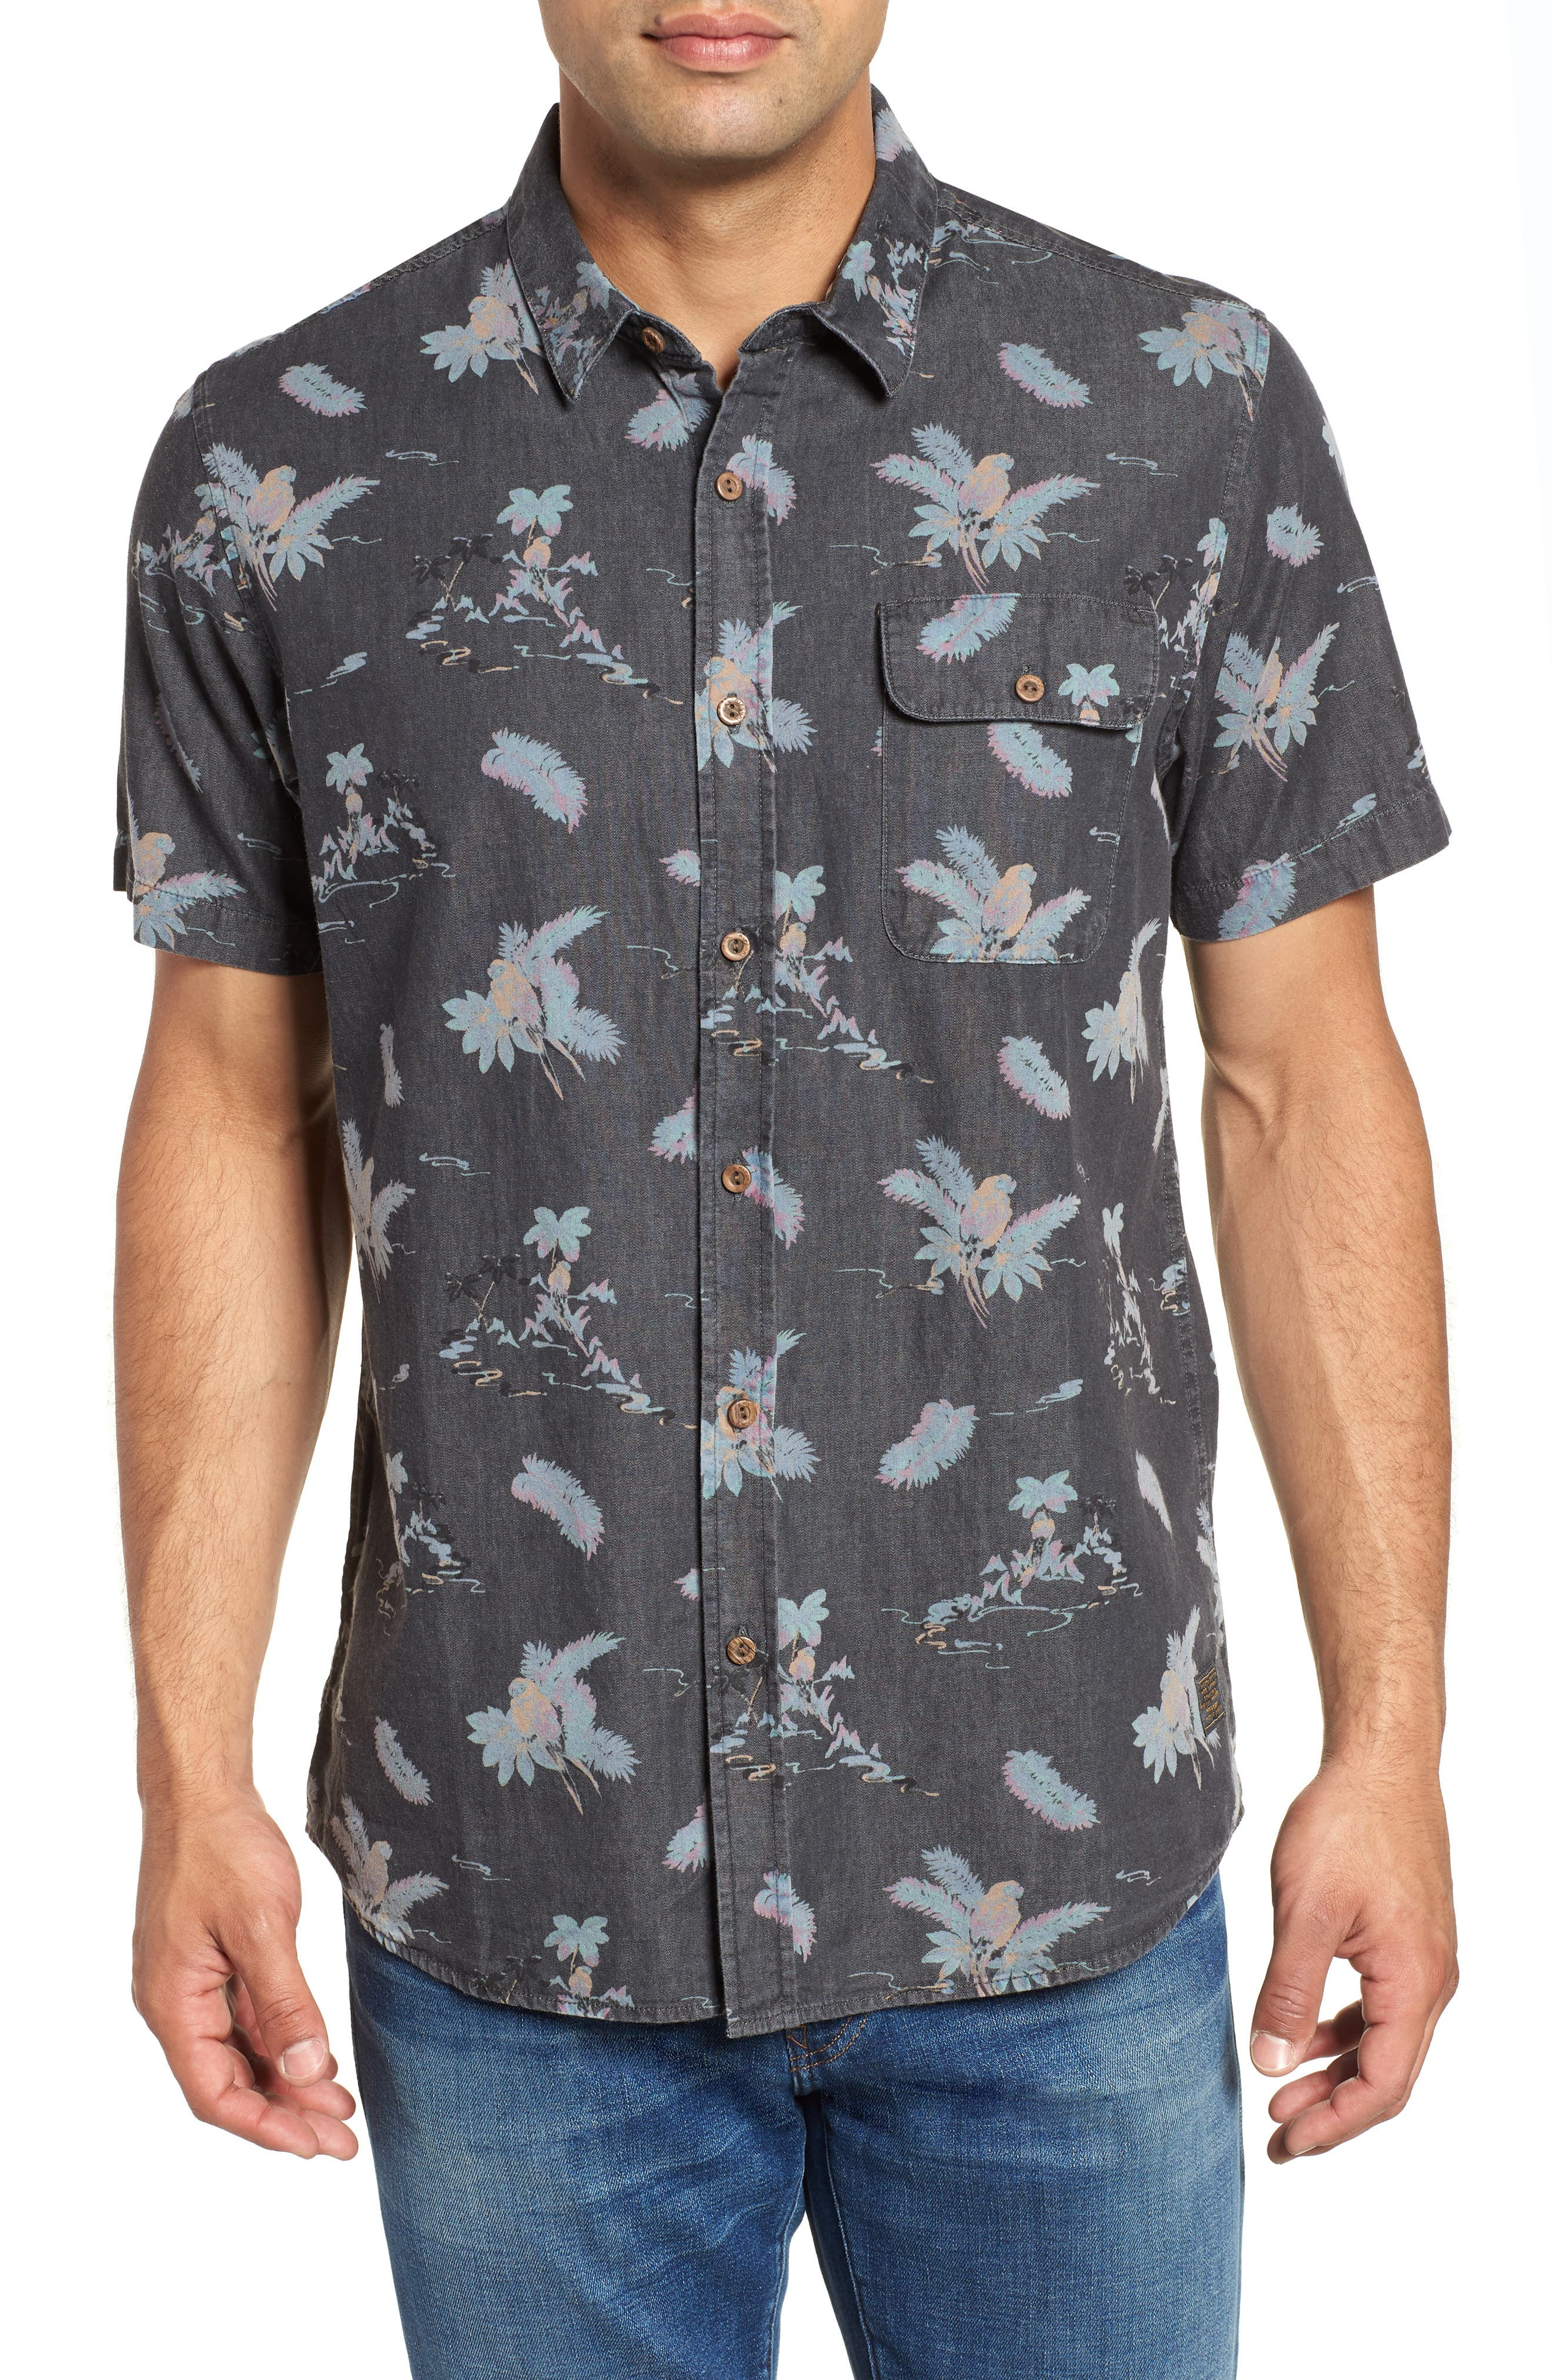 Meledrone Woven Shirt,                             Main thumbnail 1, color,